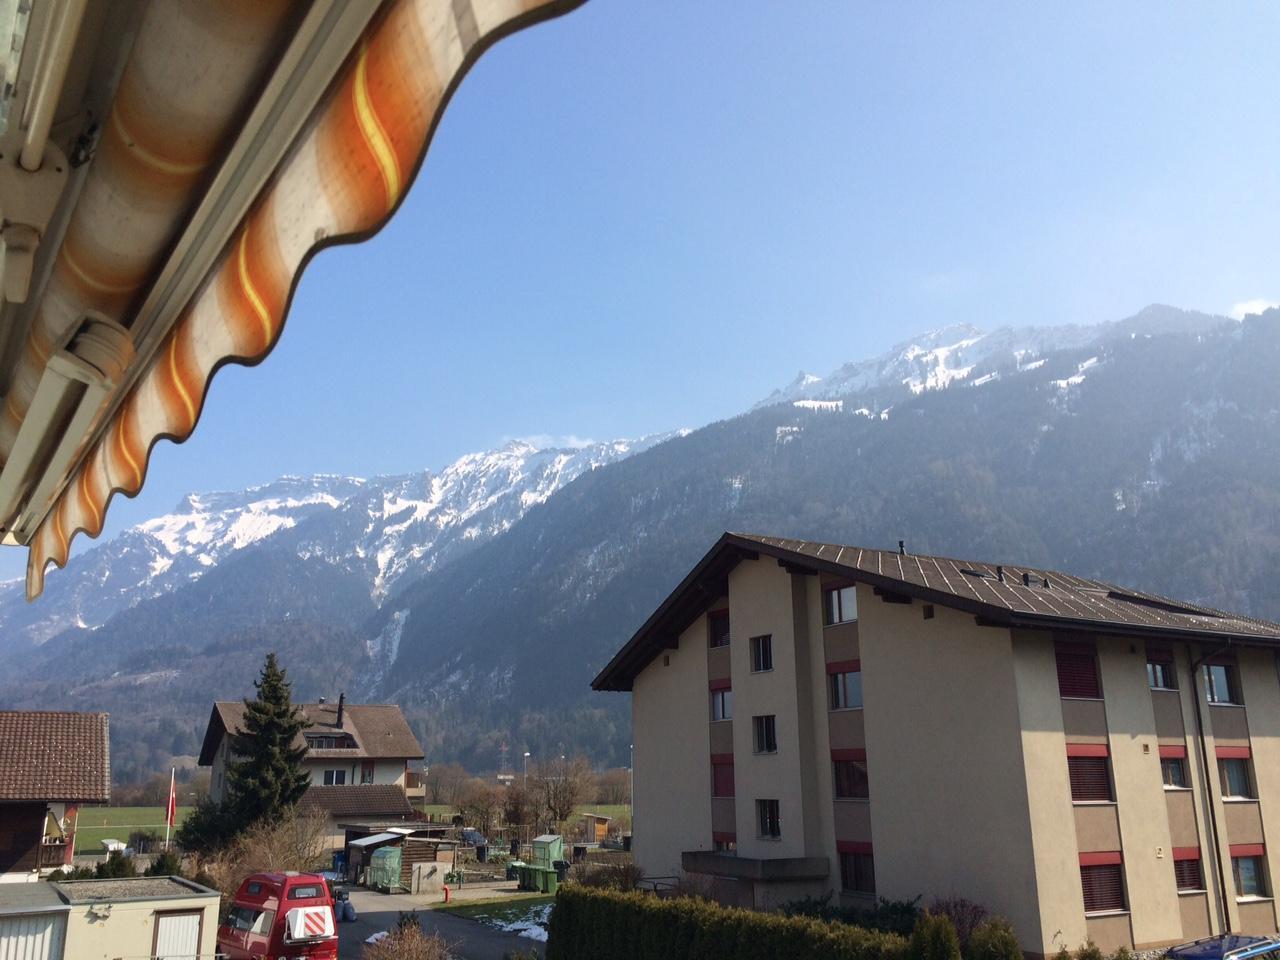 Ferien In Der Jungfrauregion